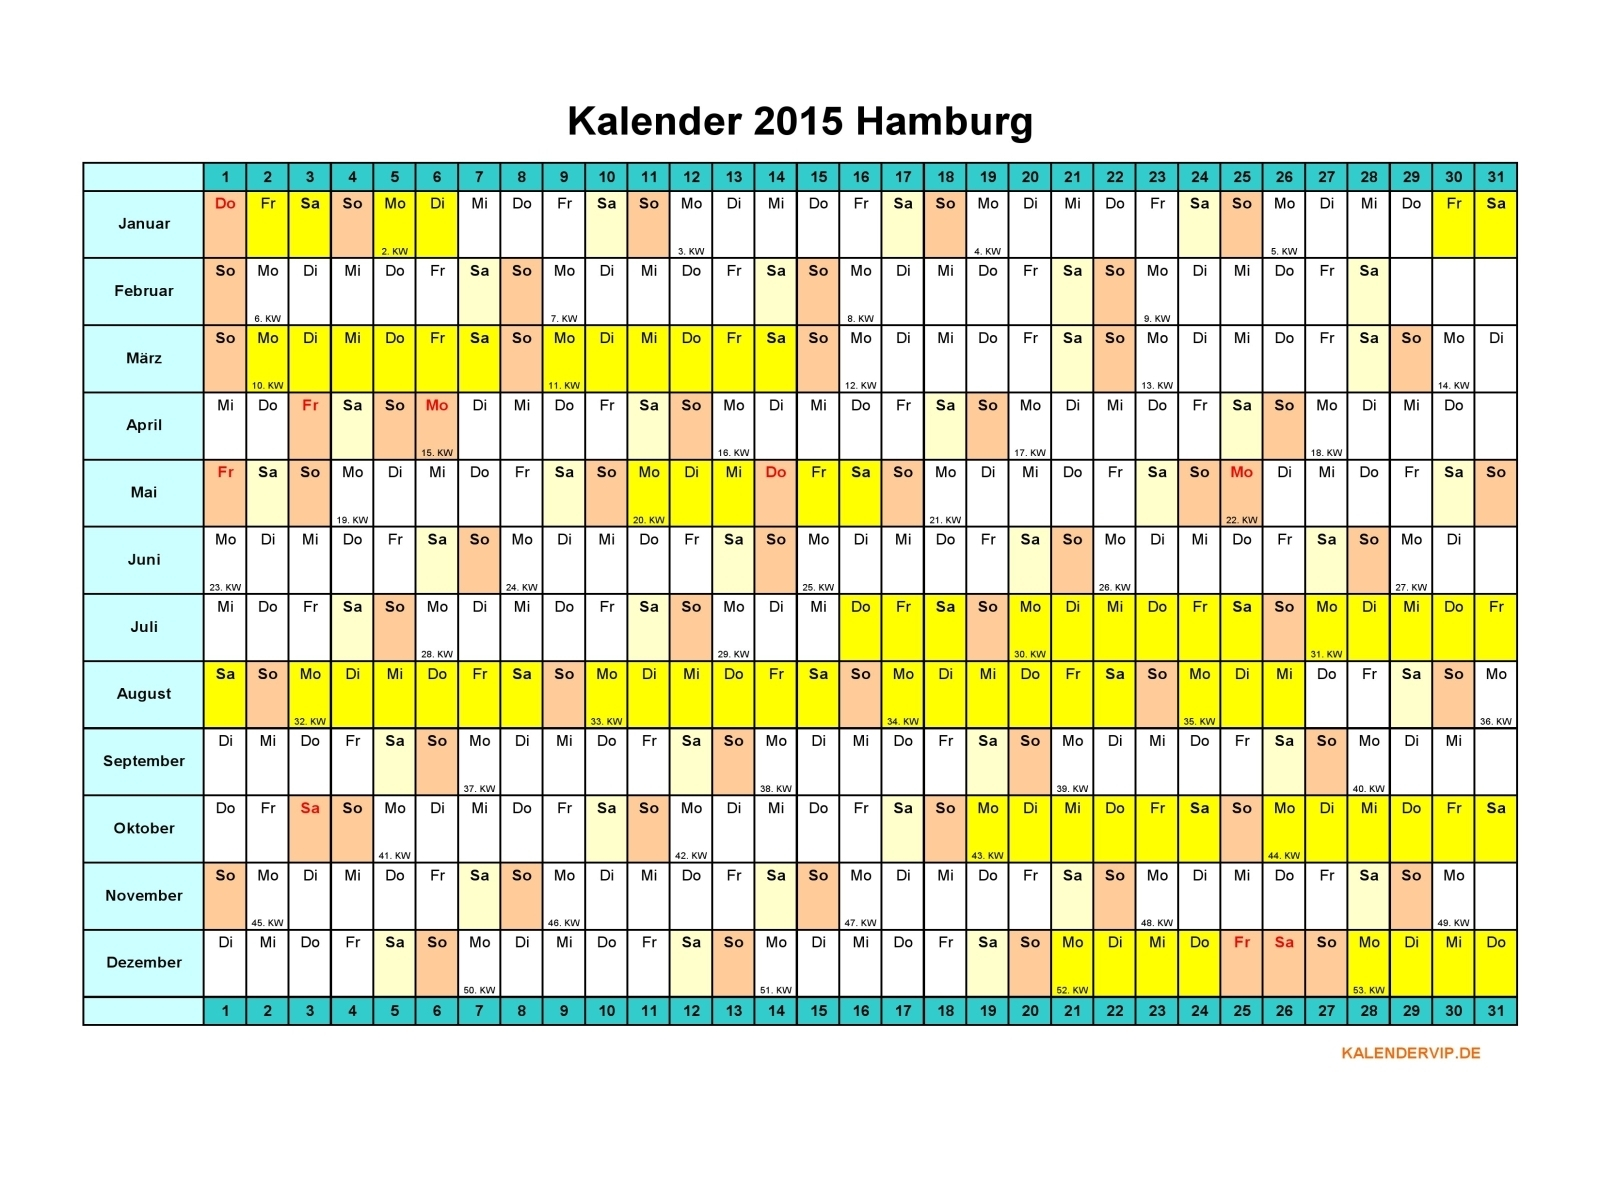 Kalender 2015 Hamburg - KalenderVIP